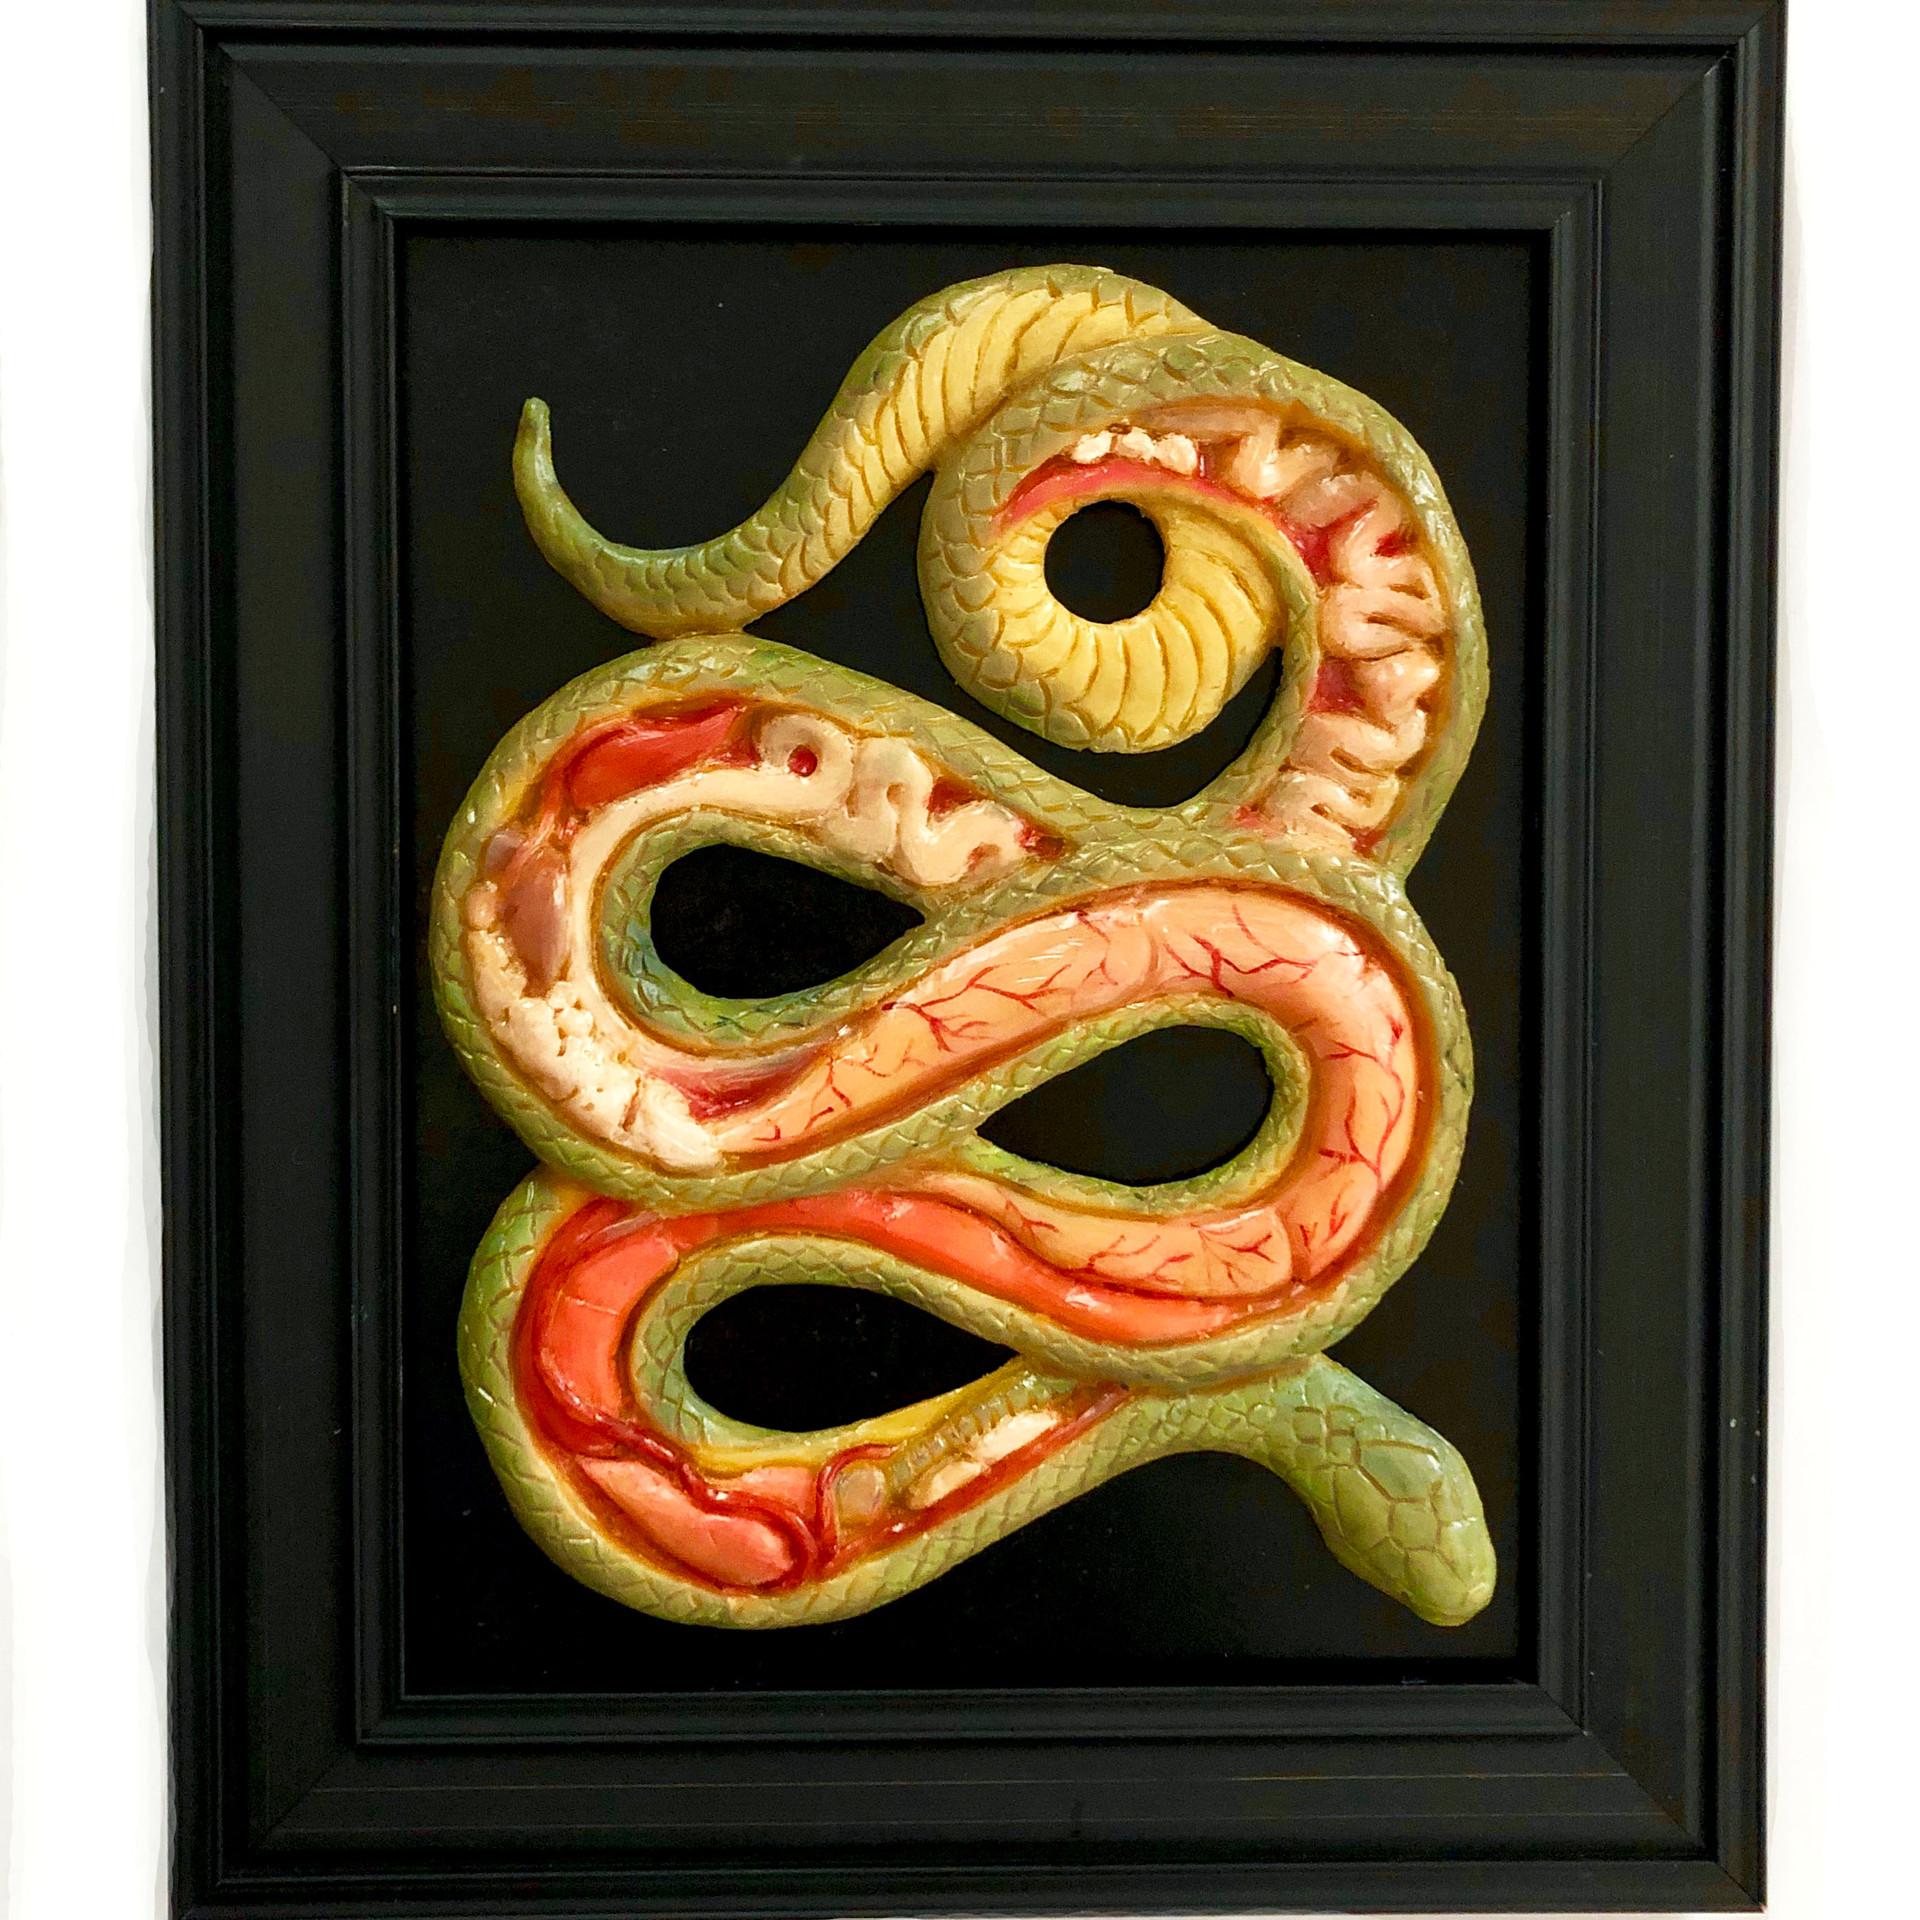 Snake Anatomy, 14x11 inches